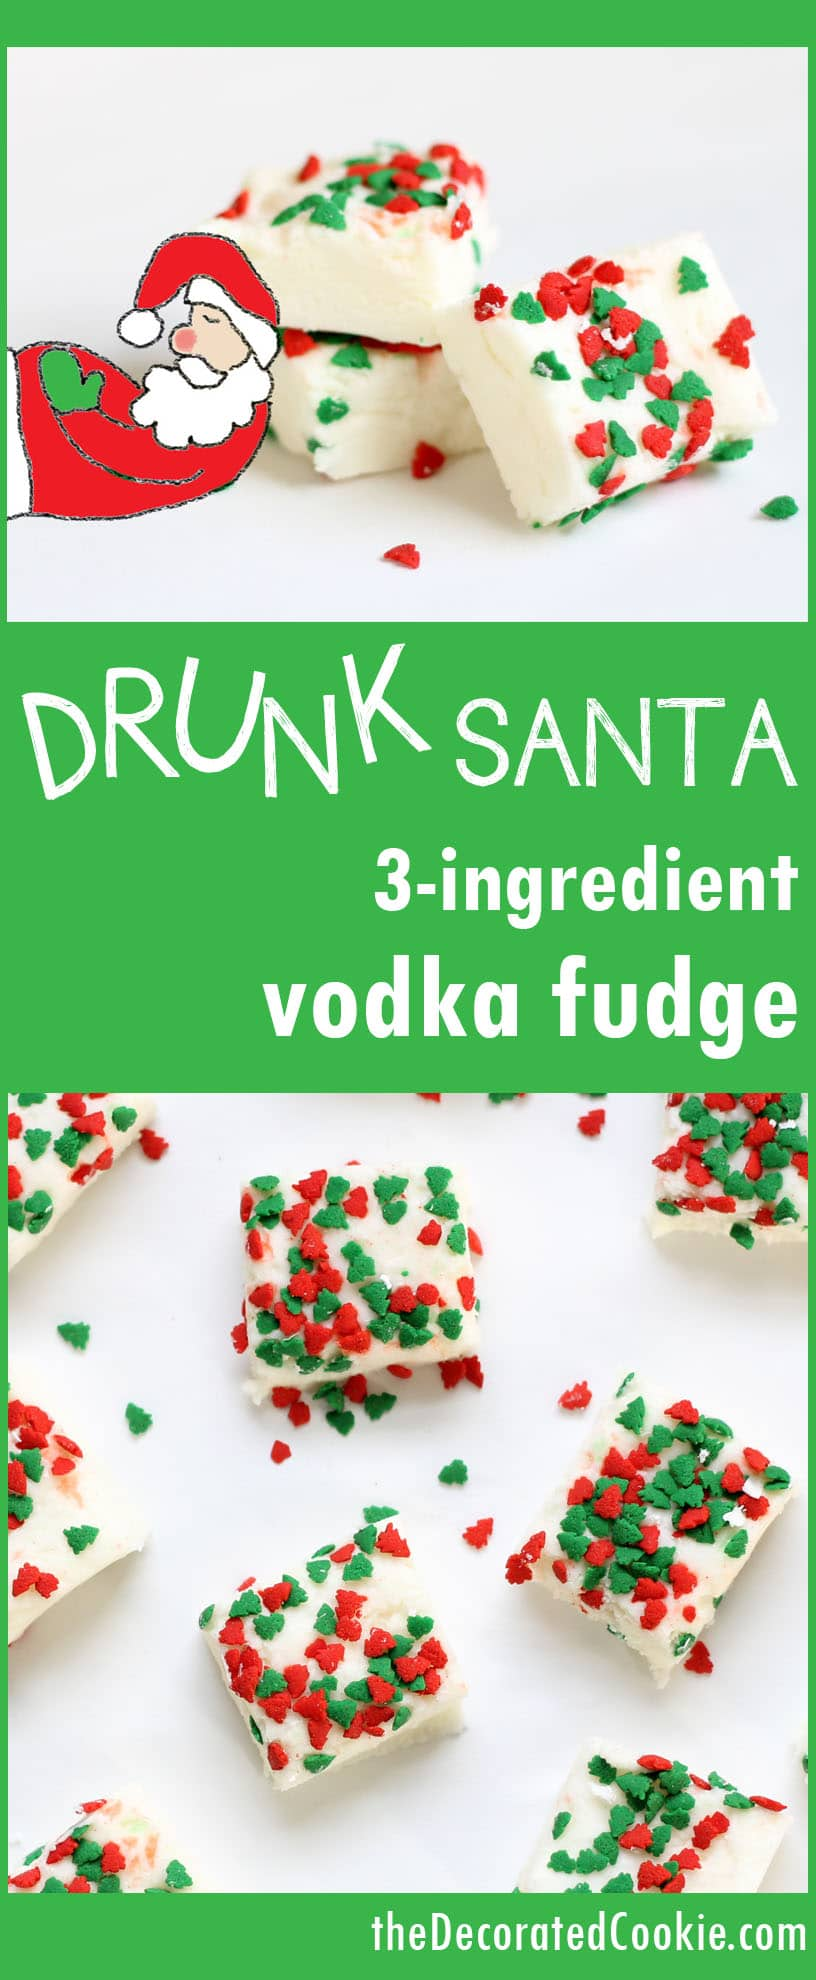 drunk Santa fudge for Christmas - 3-ingredient boozy vodka fudge